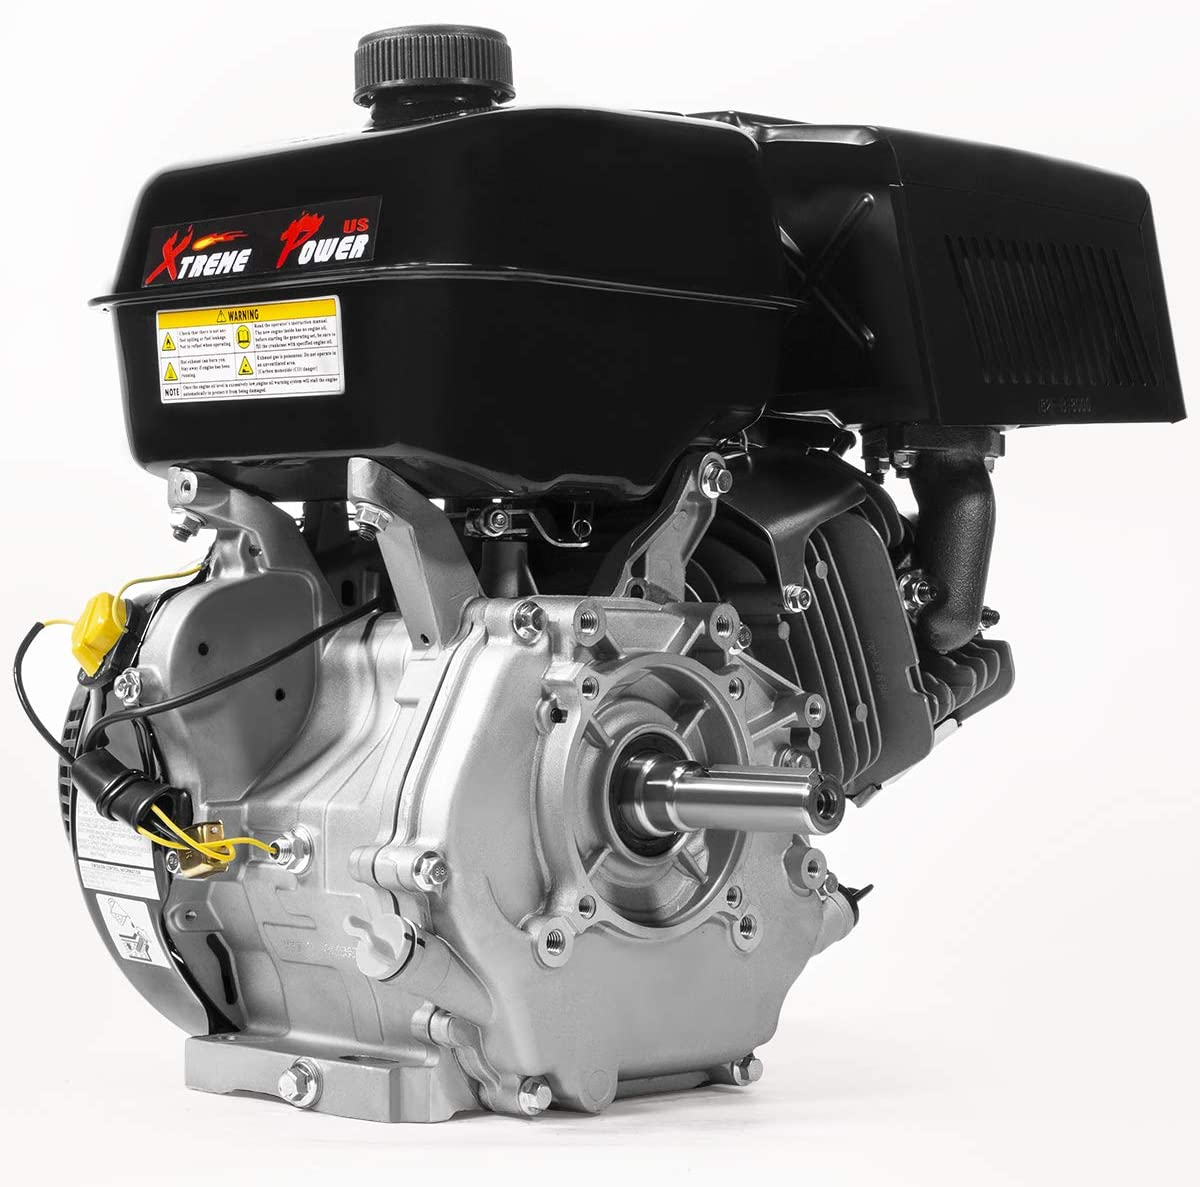 XtremepowerUS Industrial 15HP 4-Stroke Gas Engine Horizontal OHV Grade Gasoline Recoil Start Engine GoKart Log Splitter Lifan Engine EPA Carb, Black